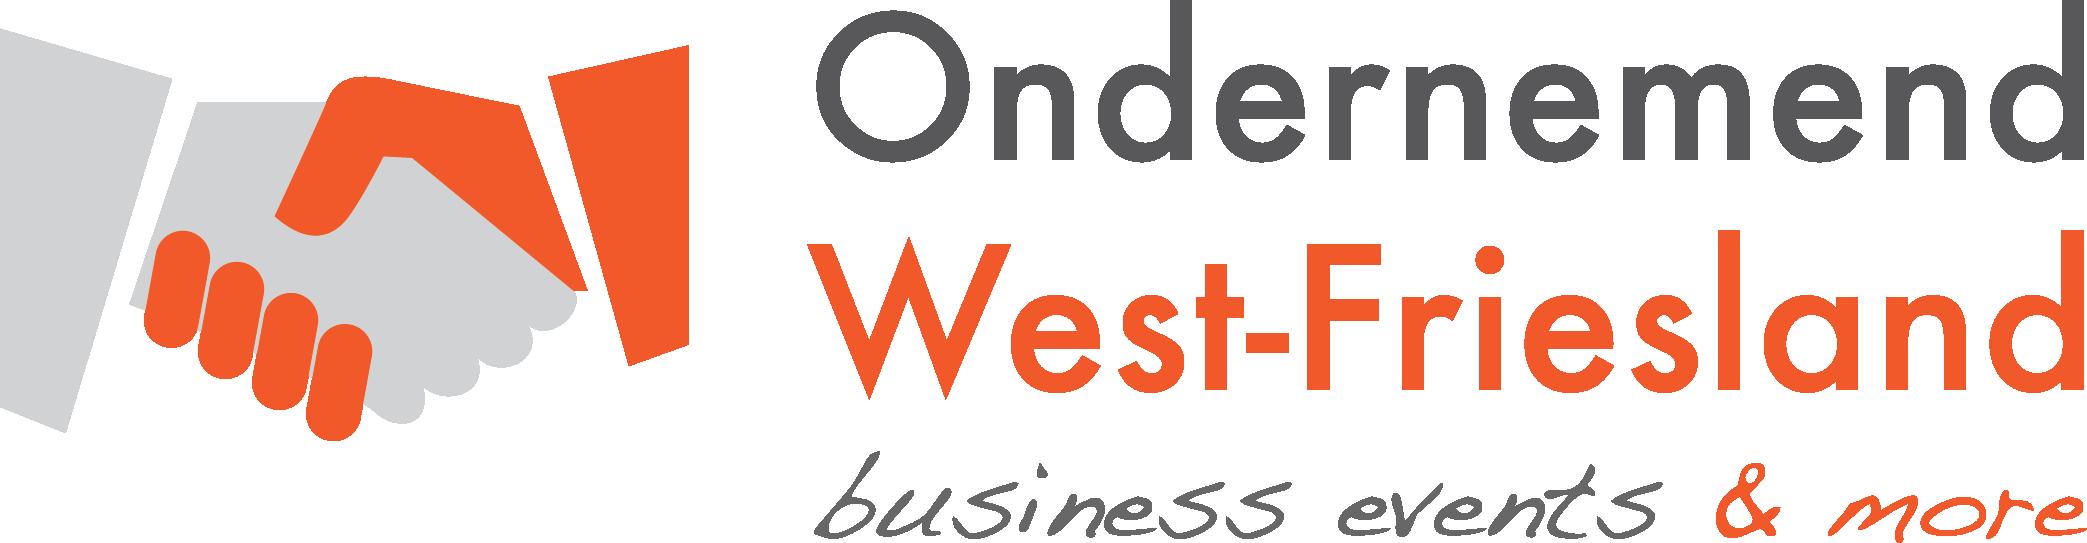 Ondernemend West-Friesland Logo